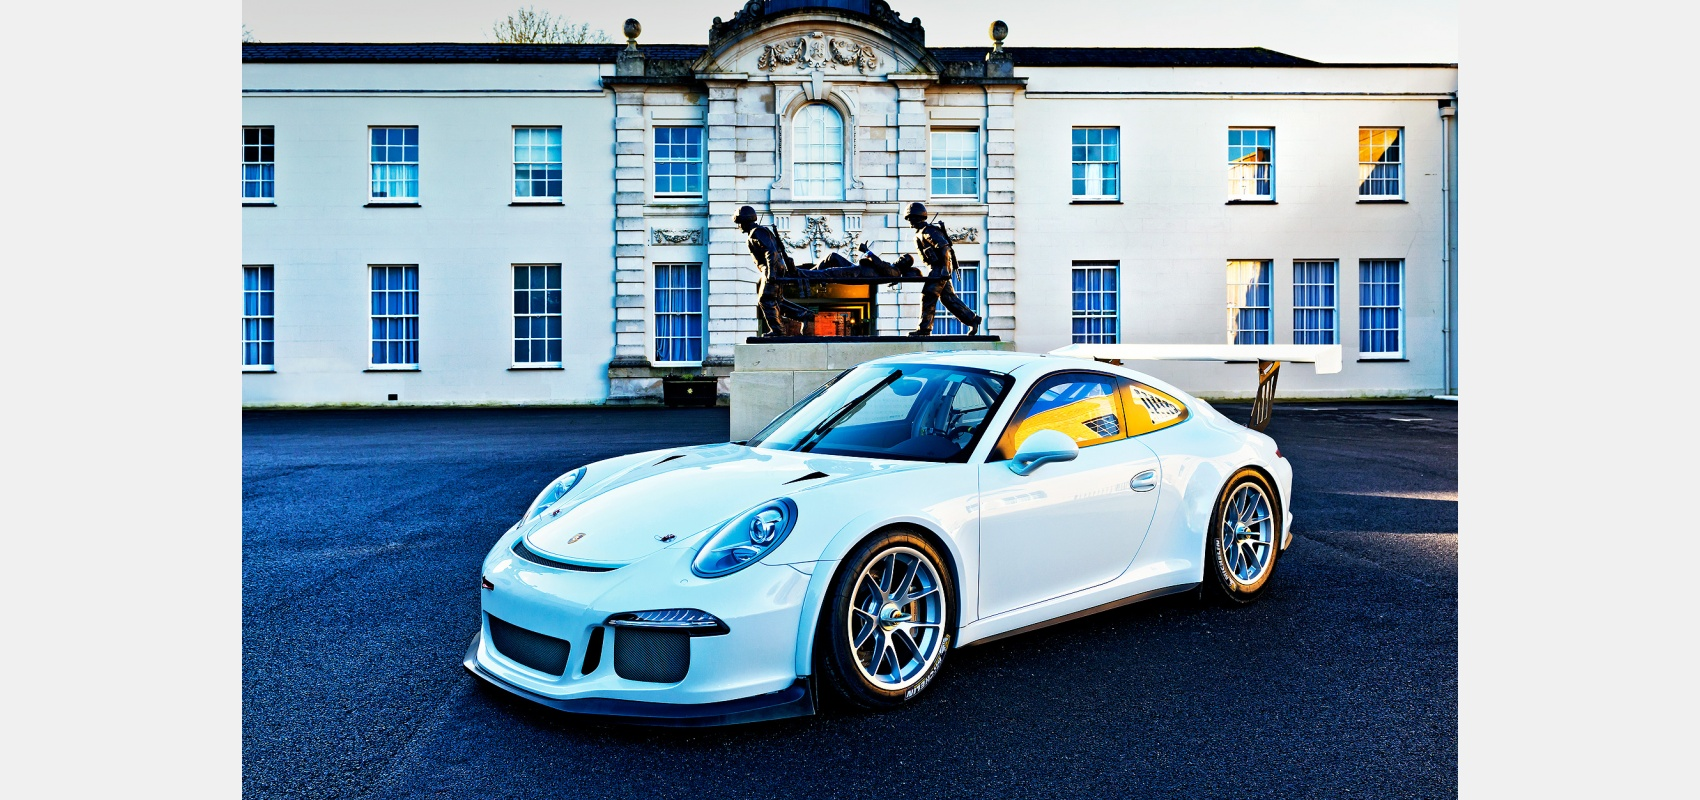 Motorsport photography/Porsche 911/991GT3/race prepared/Location picture/sunset light